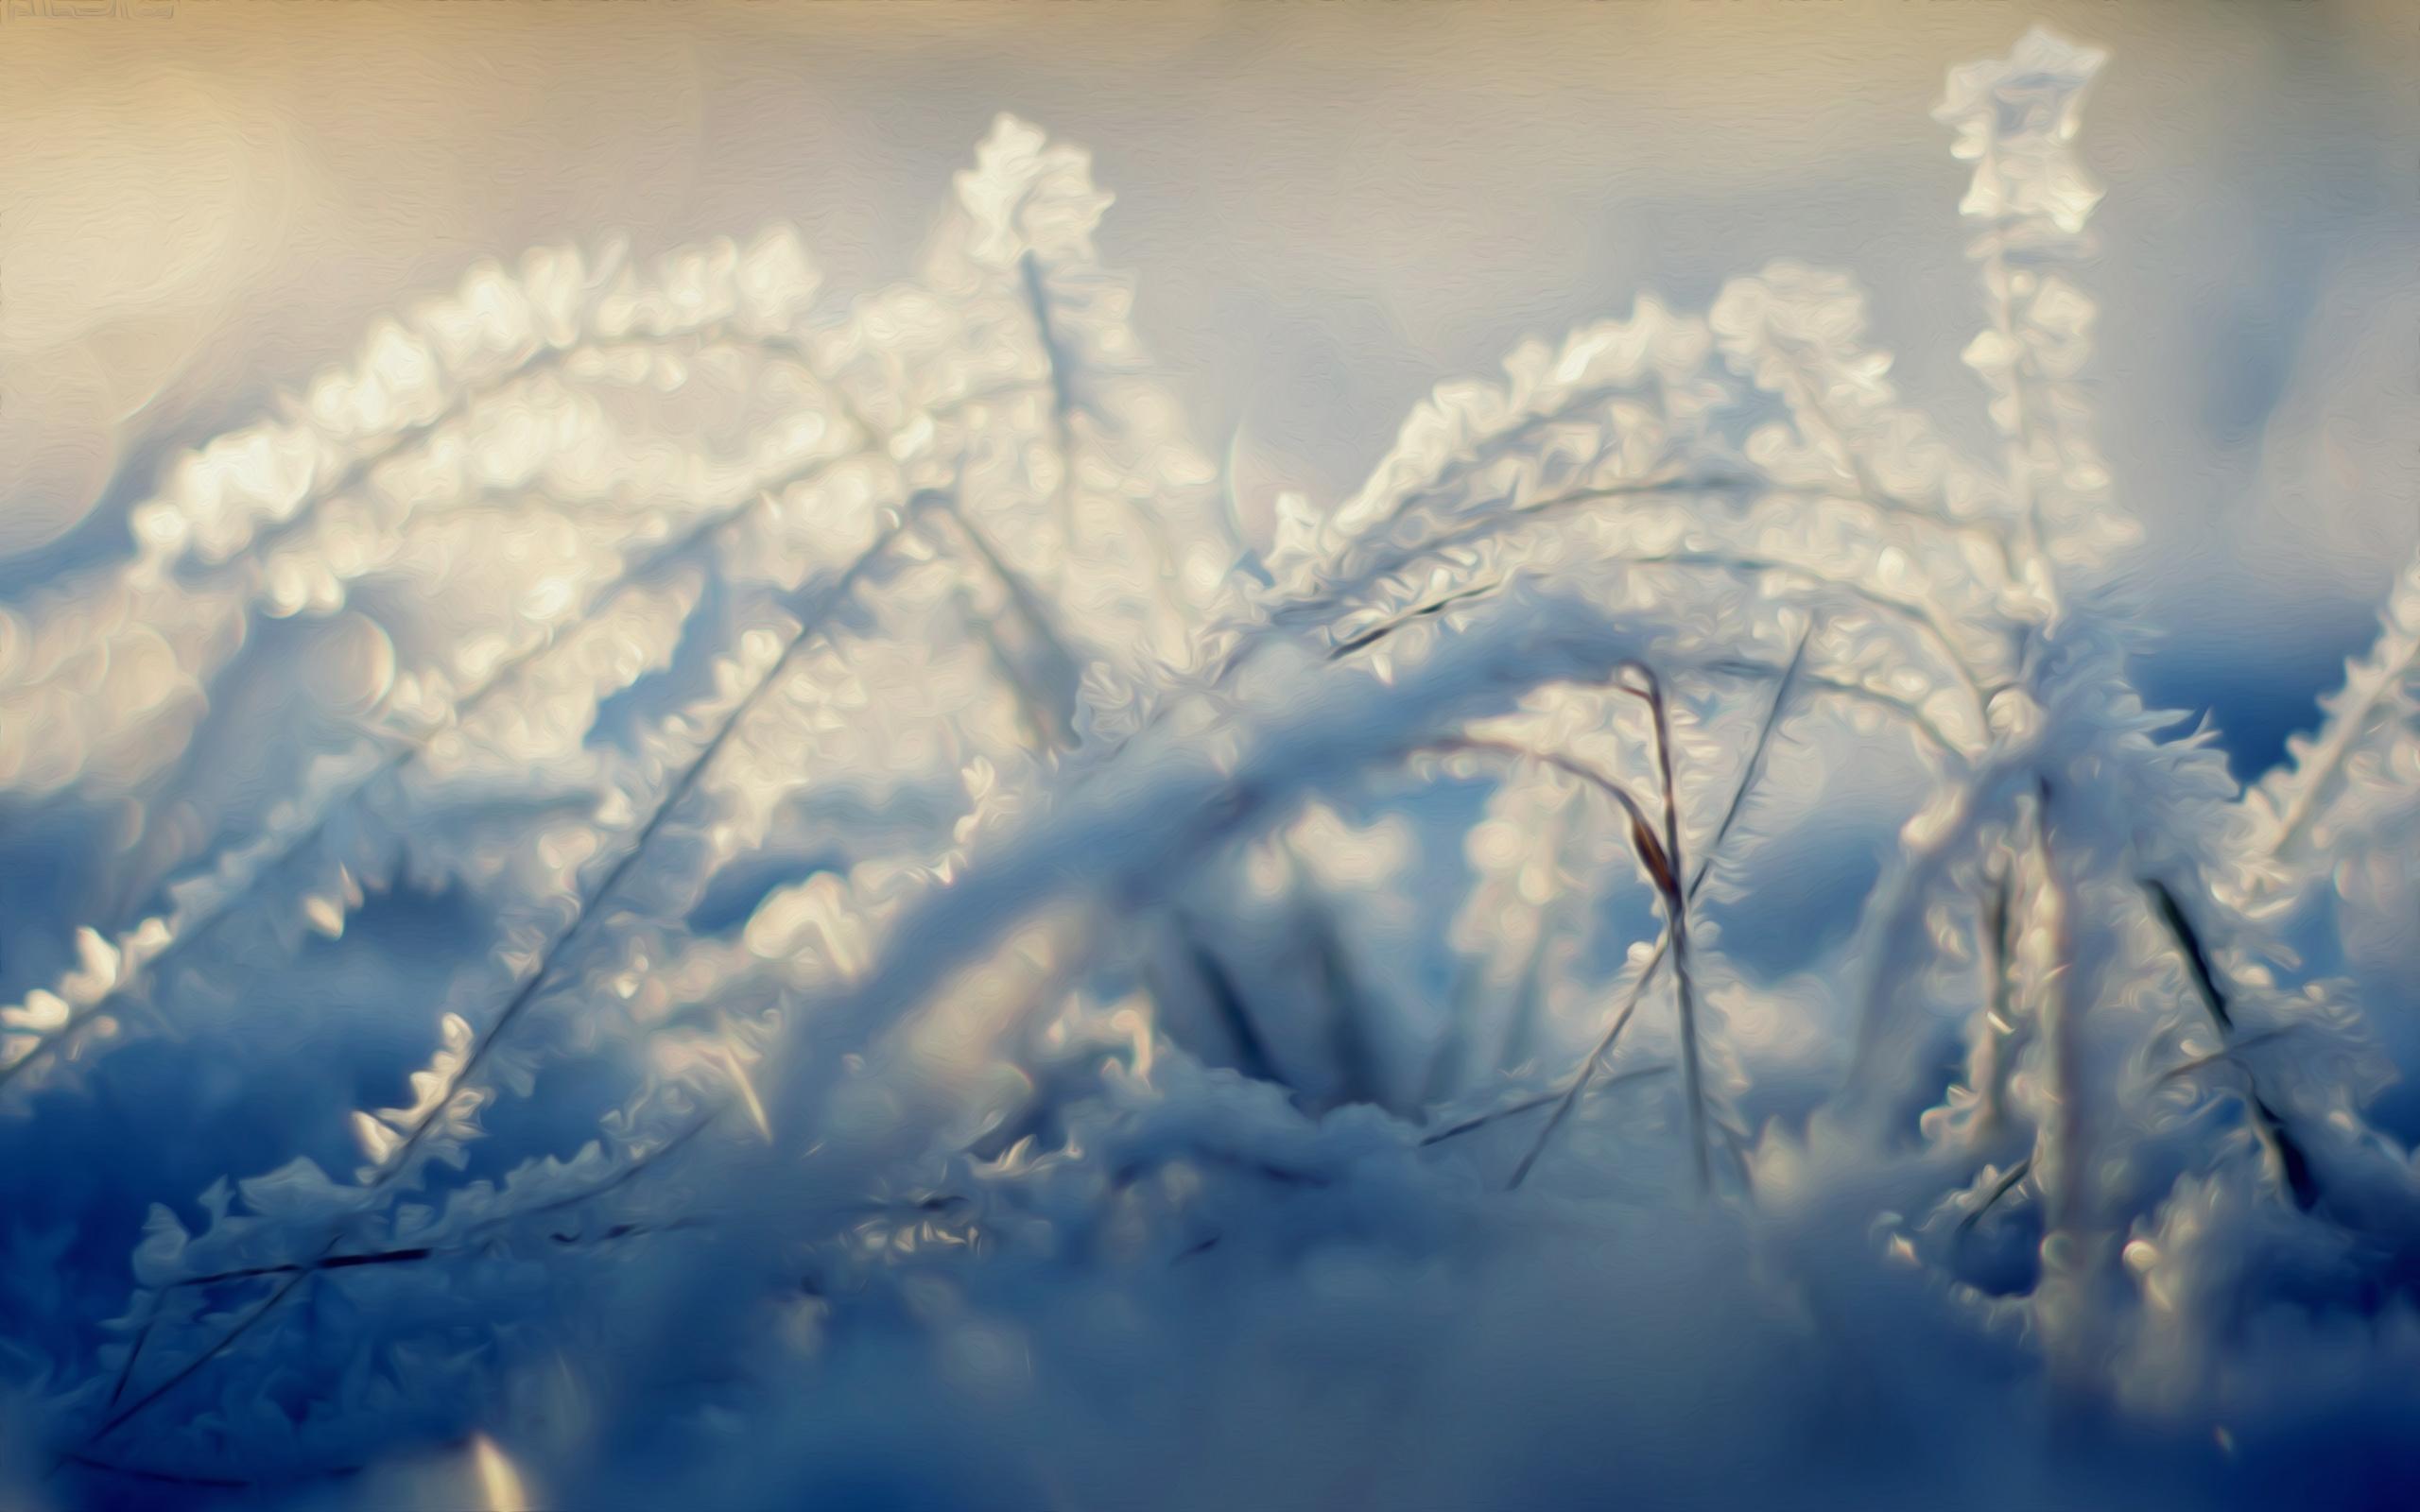 winter snow scene wallpapers   wwwhigh definition wallpapercom 2560x1600